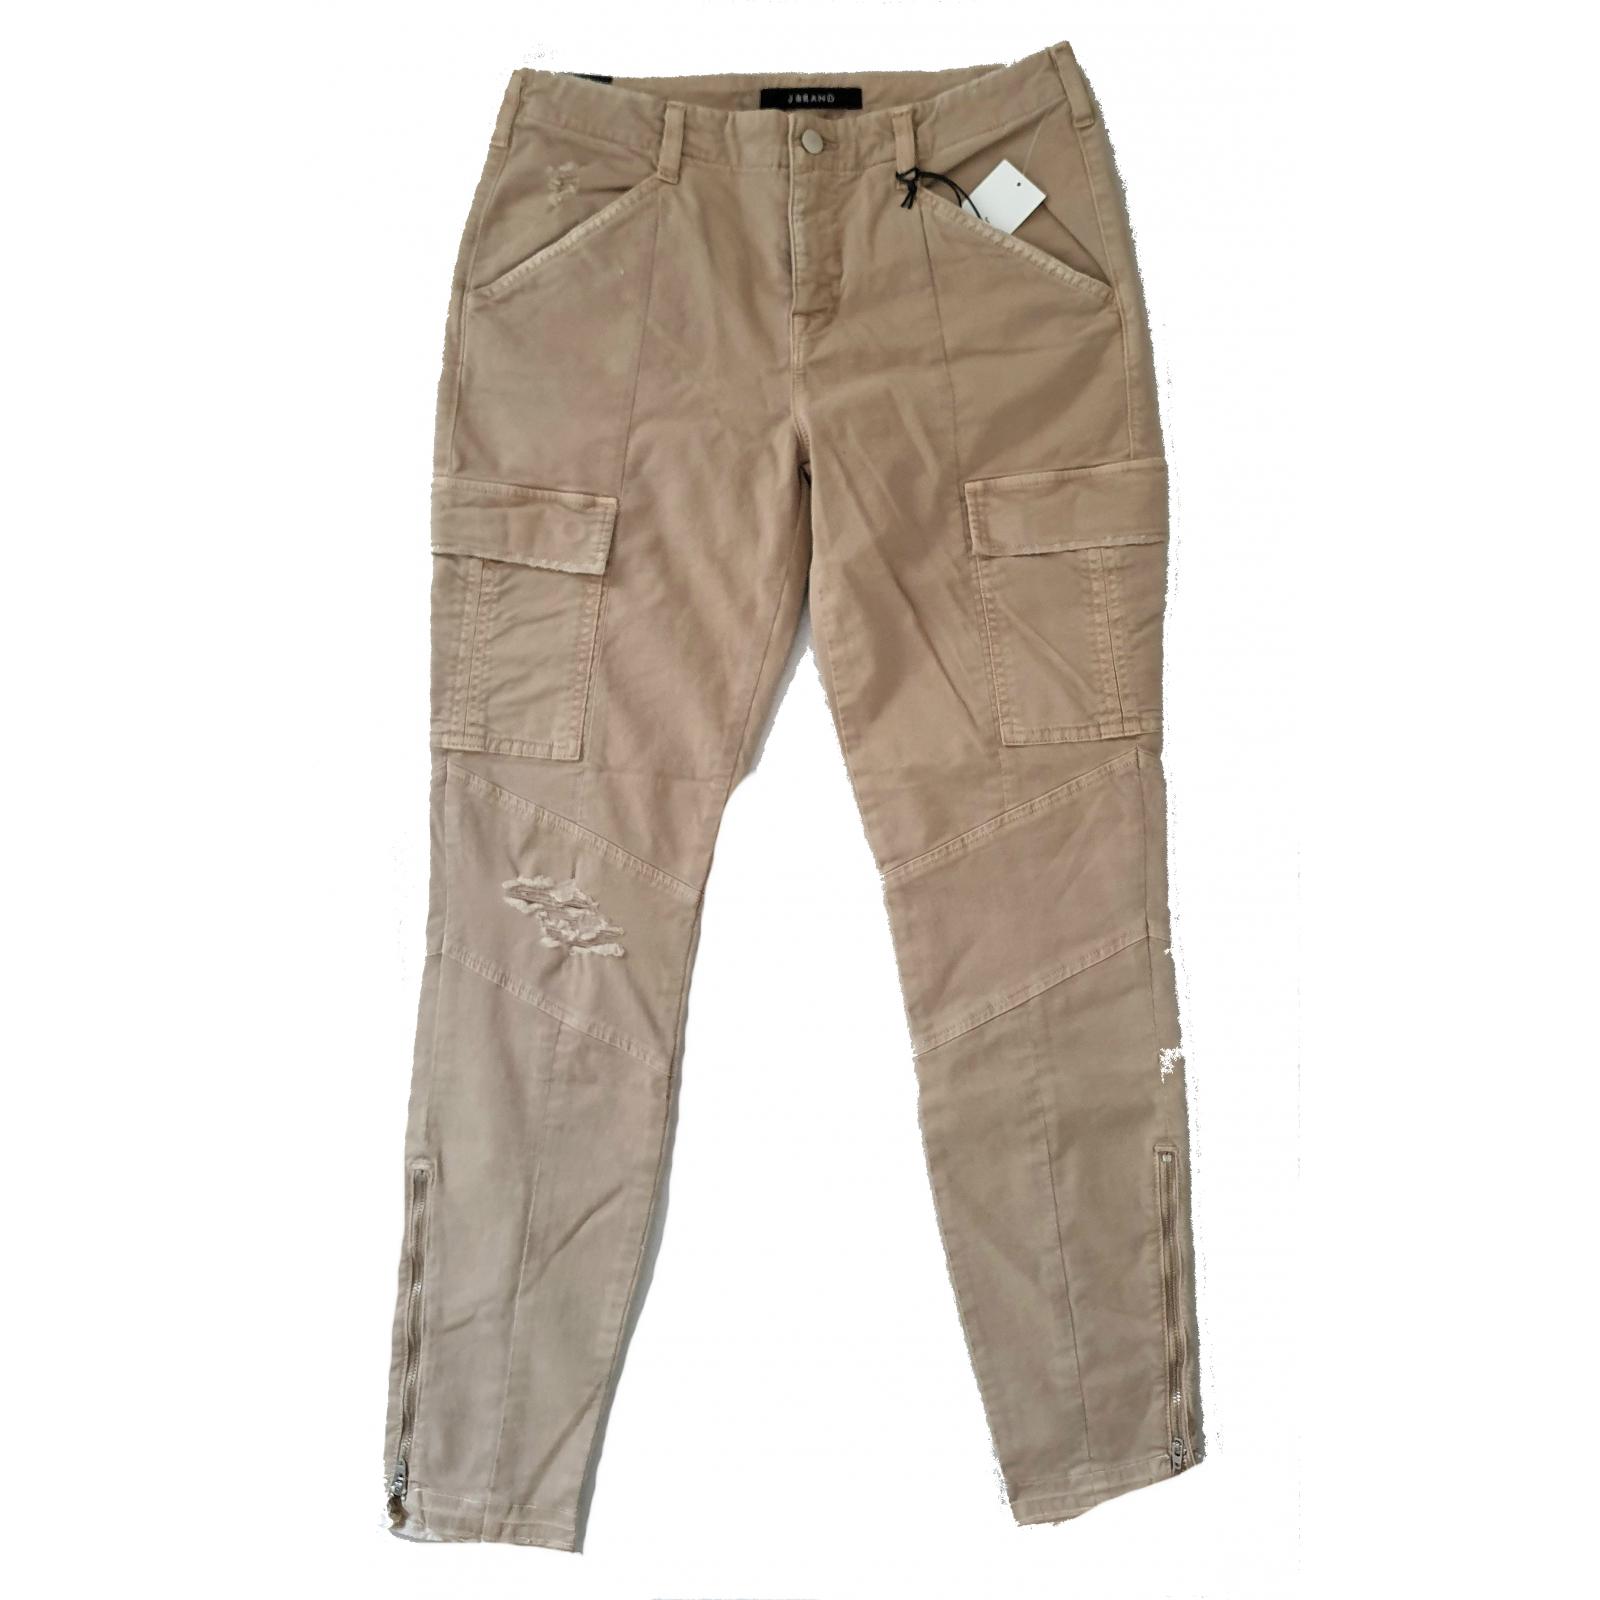 J Brand Houlihan Mid-Rise Skinny Crop Cargo Jeans 29